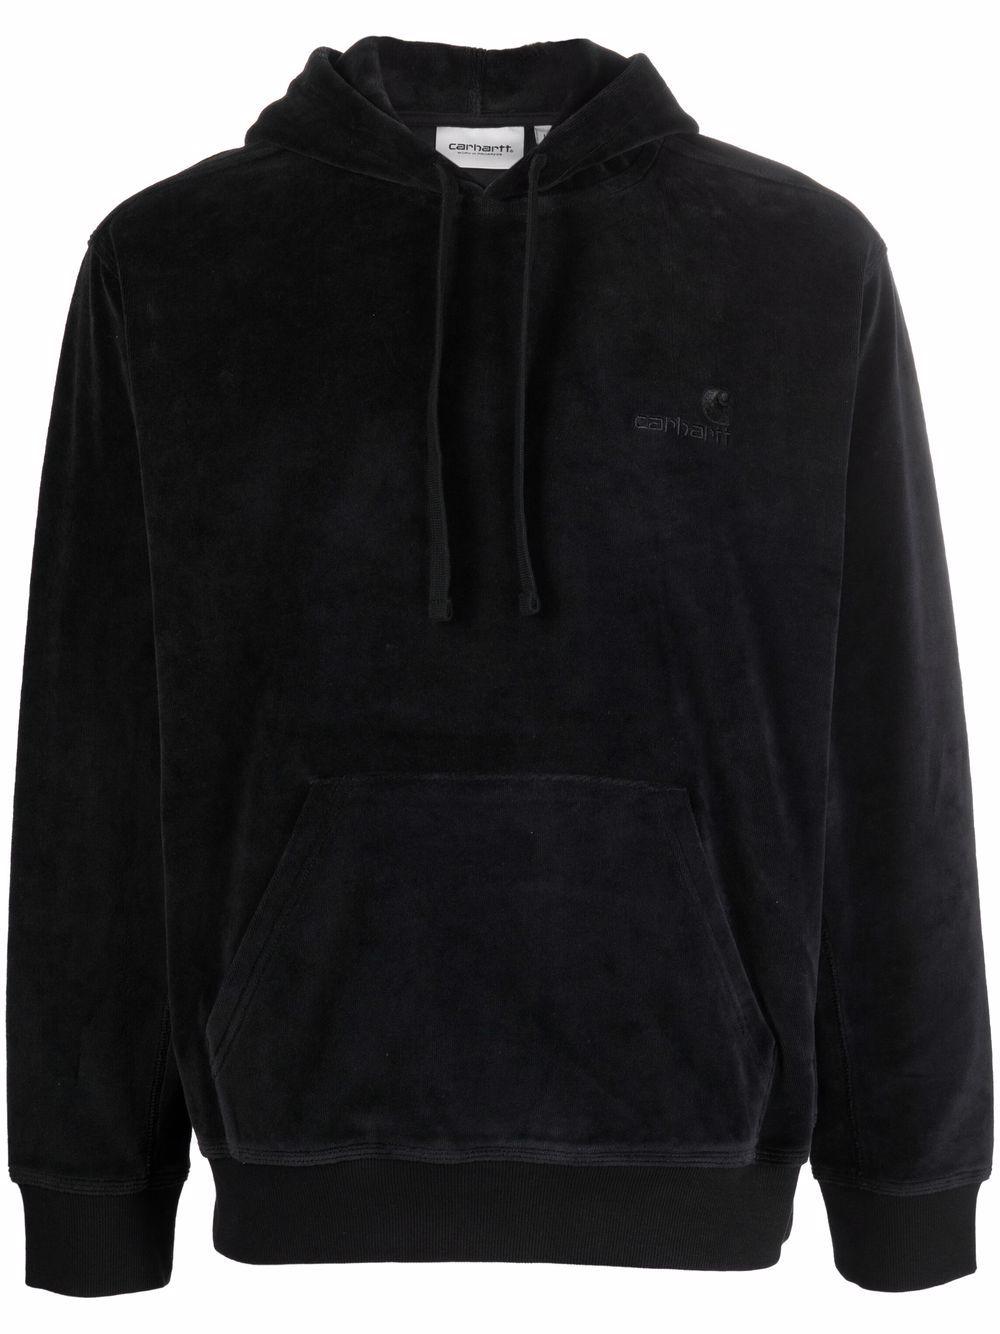 logo hoodie man black in cotton CARHARTT WIP | Sweatshirts | I02827689.XX